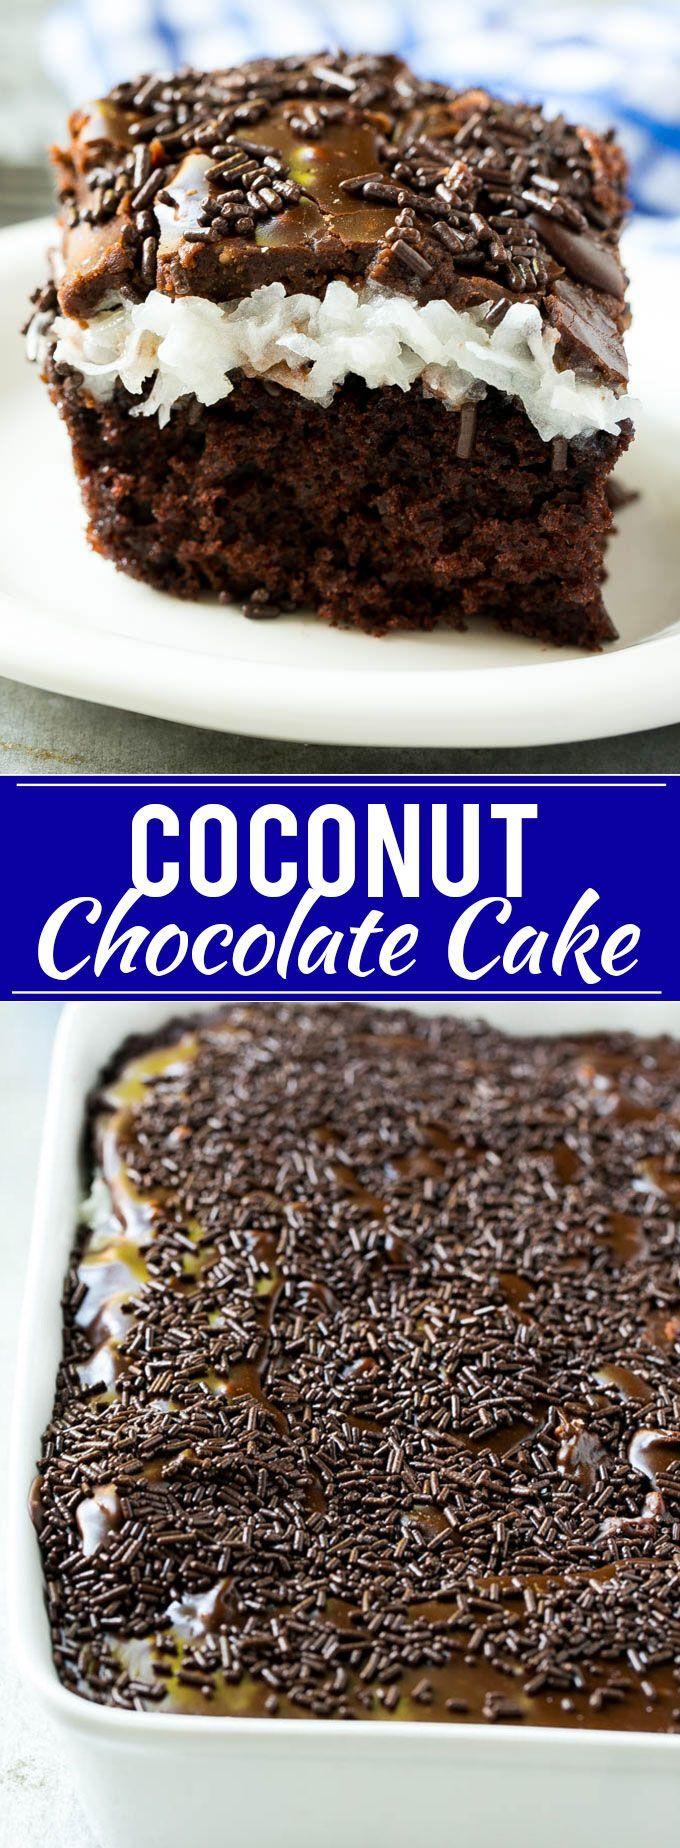 Chocolate+Coconut+Cake+Recipe+ +Easy+Chocolate+Cake+Recipe+ +Chocolate+Coconut+Recipe